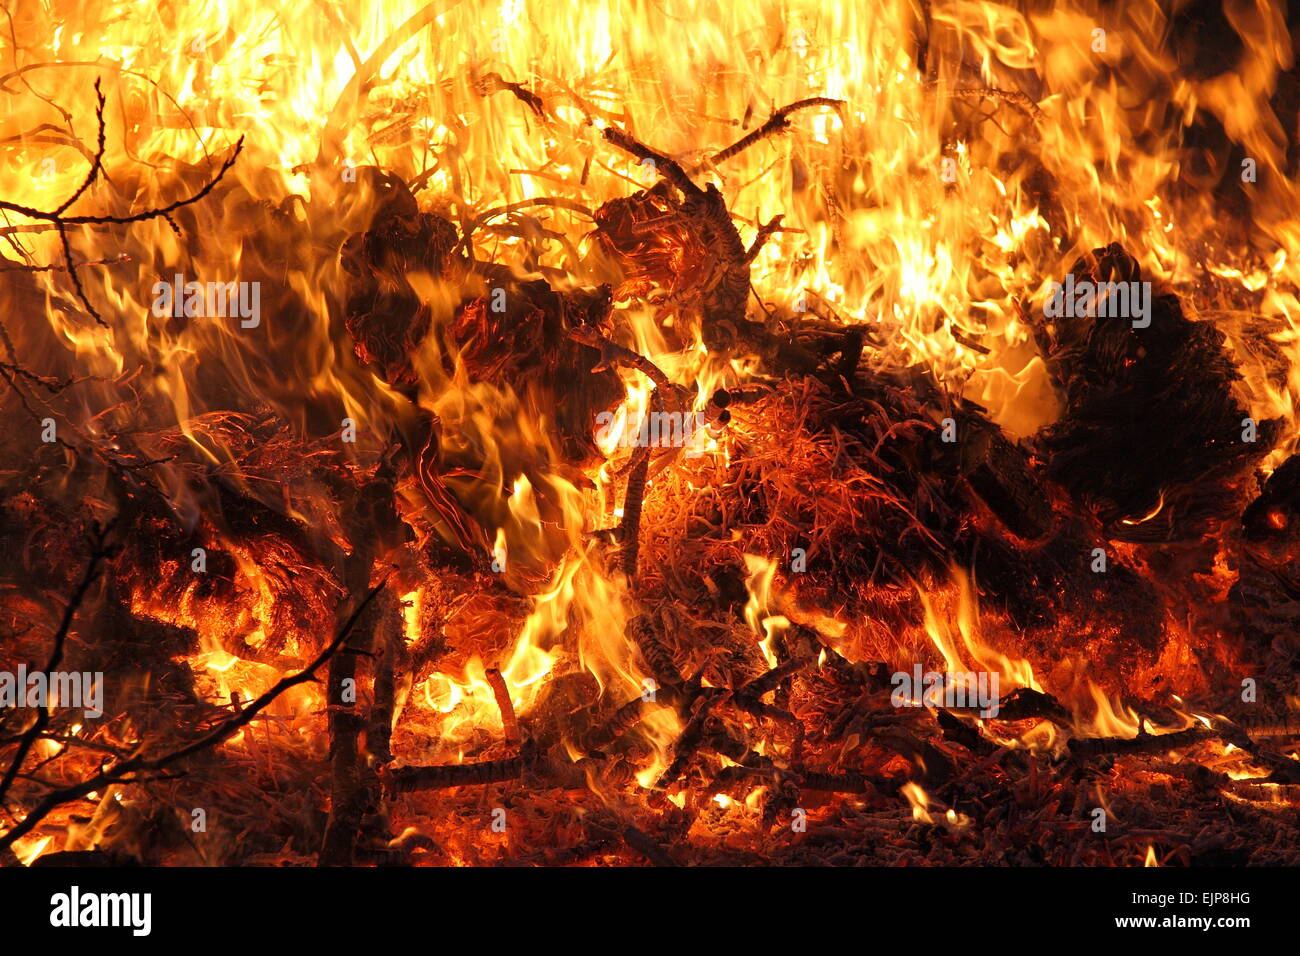 blazing fire close-up - Stock Image